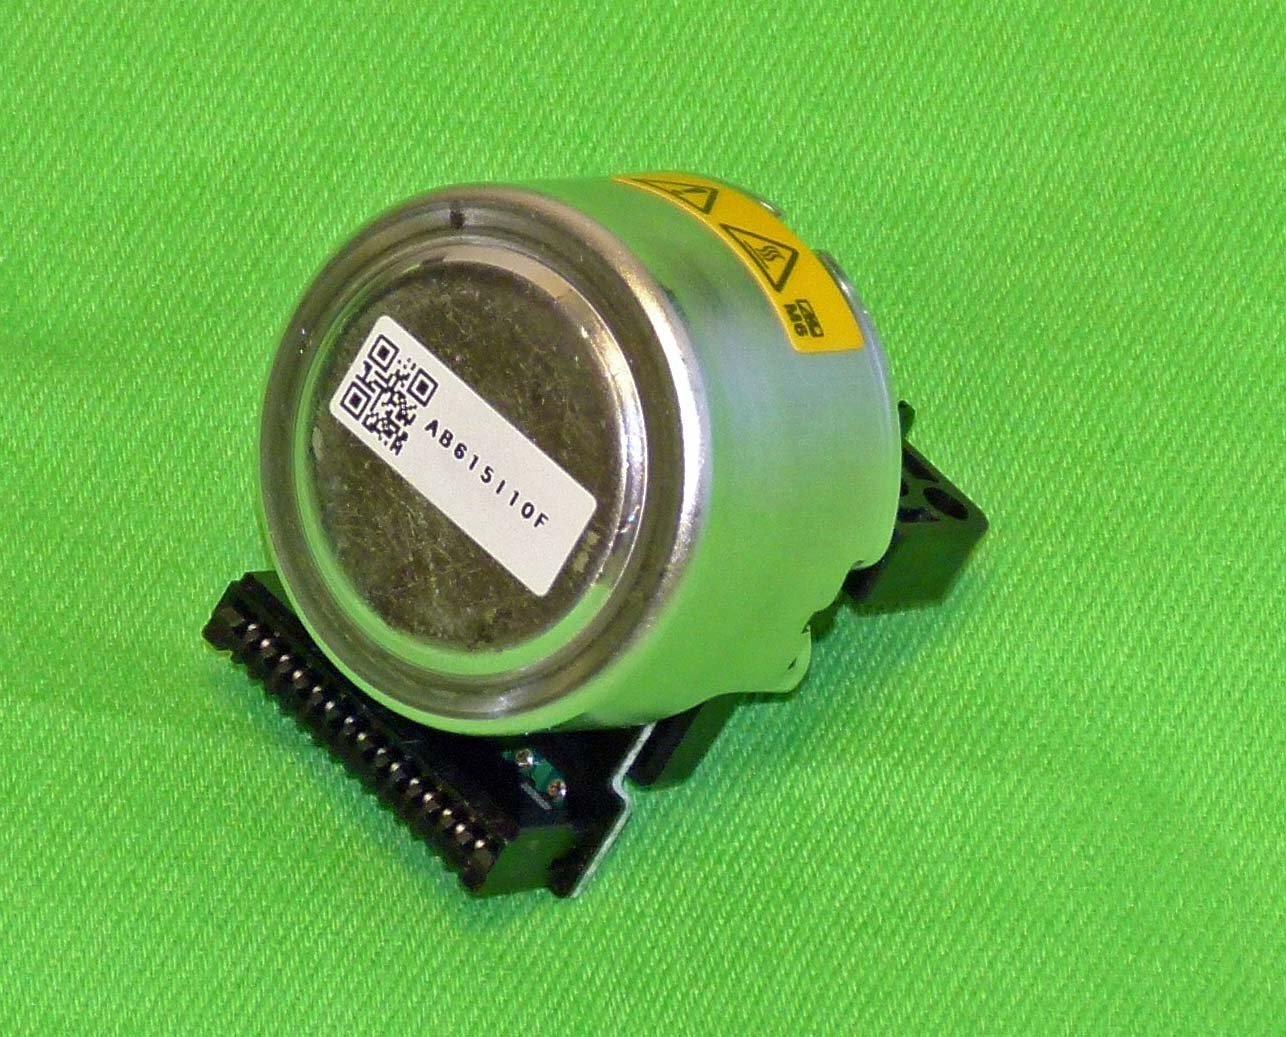 OEM Epson Print Head Specifically For: RP-U420 (021), RP-U420P (021), TM-U210AN by Epson (Image #1)